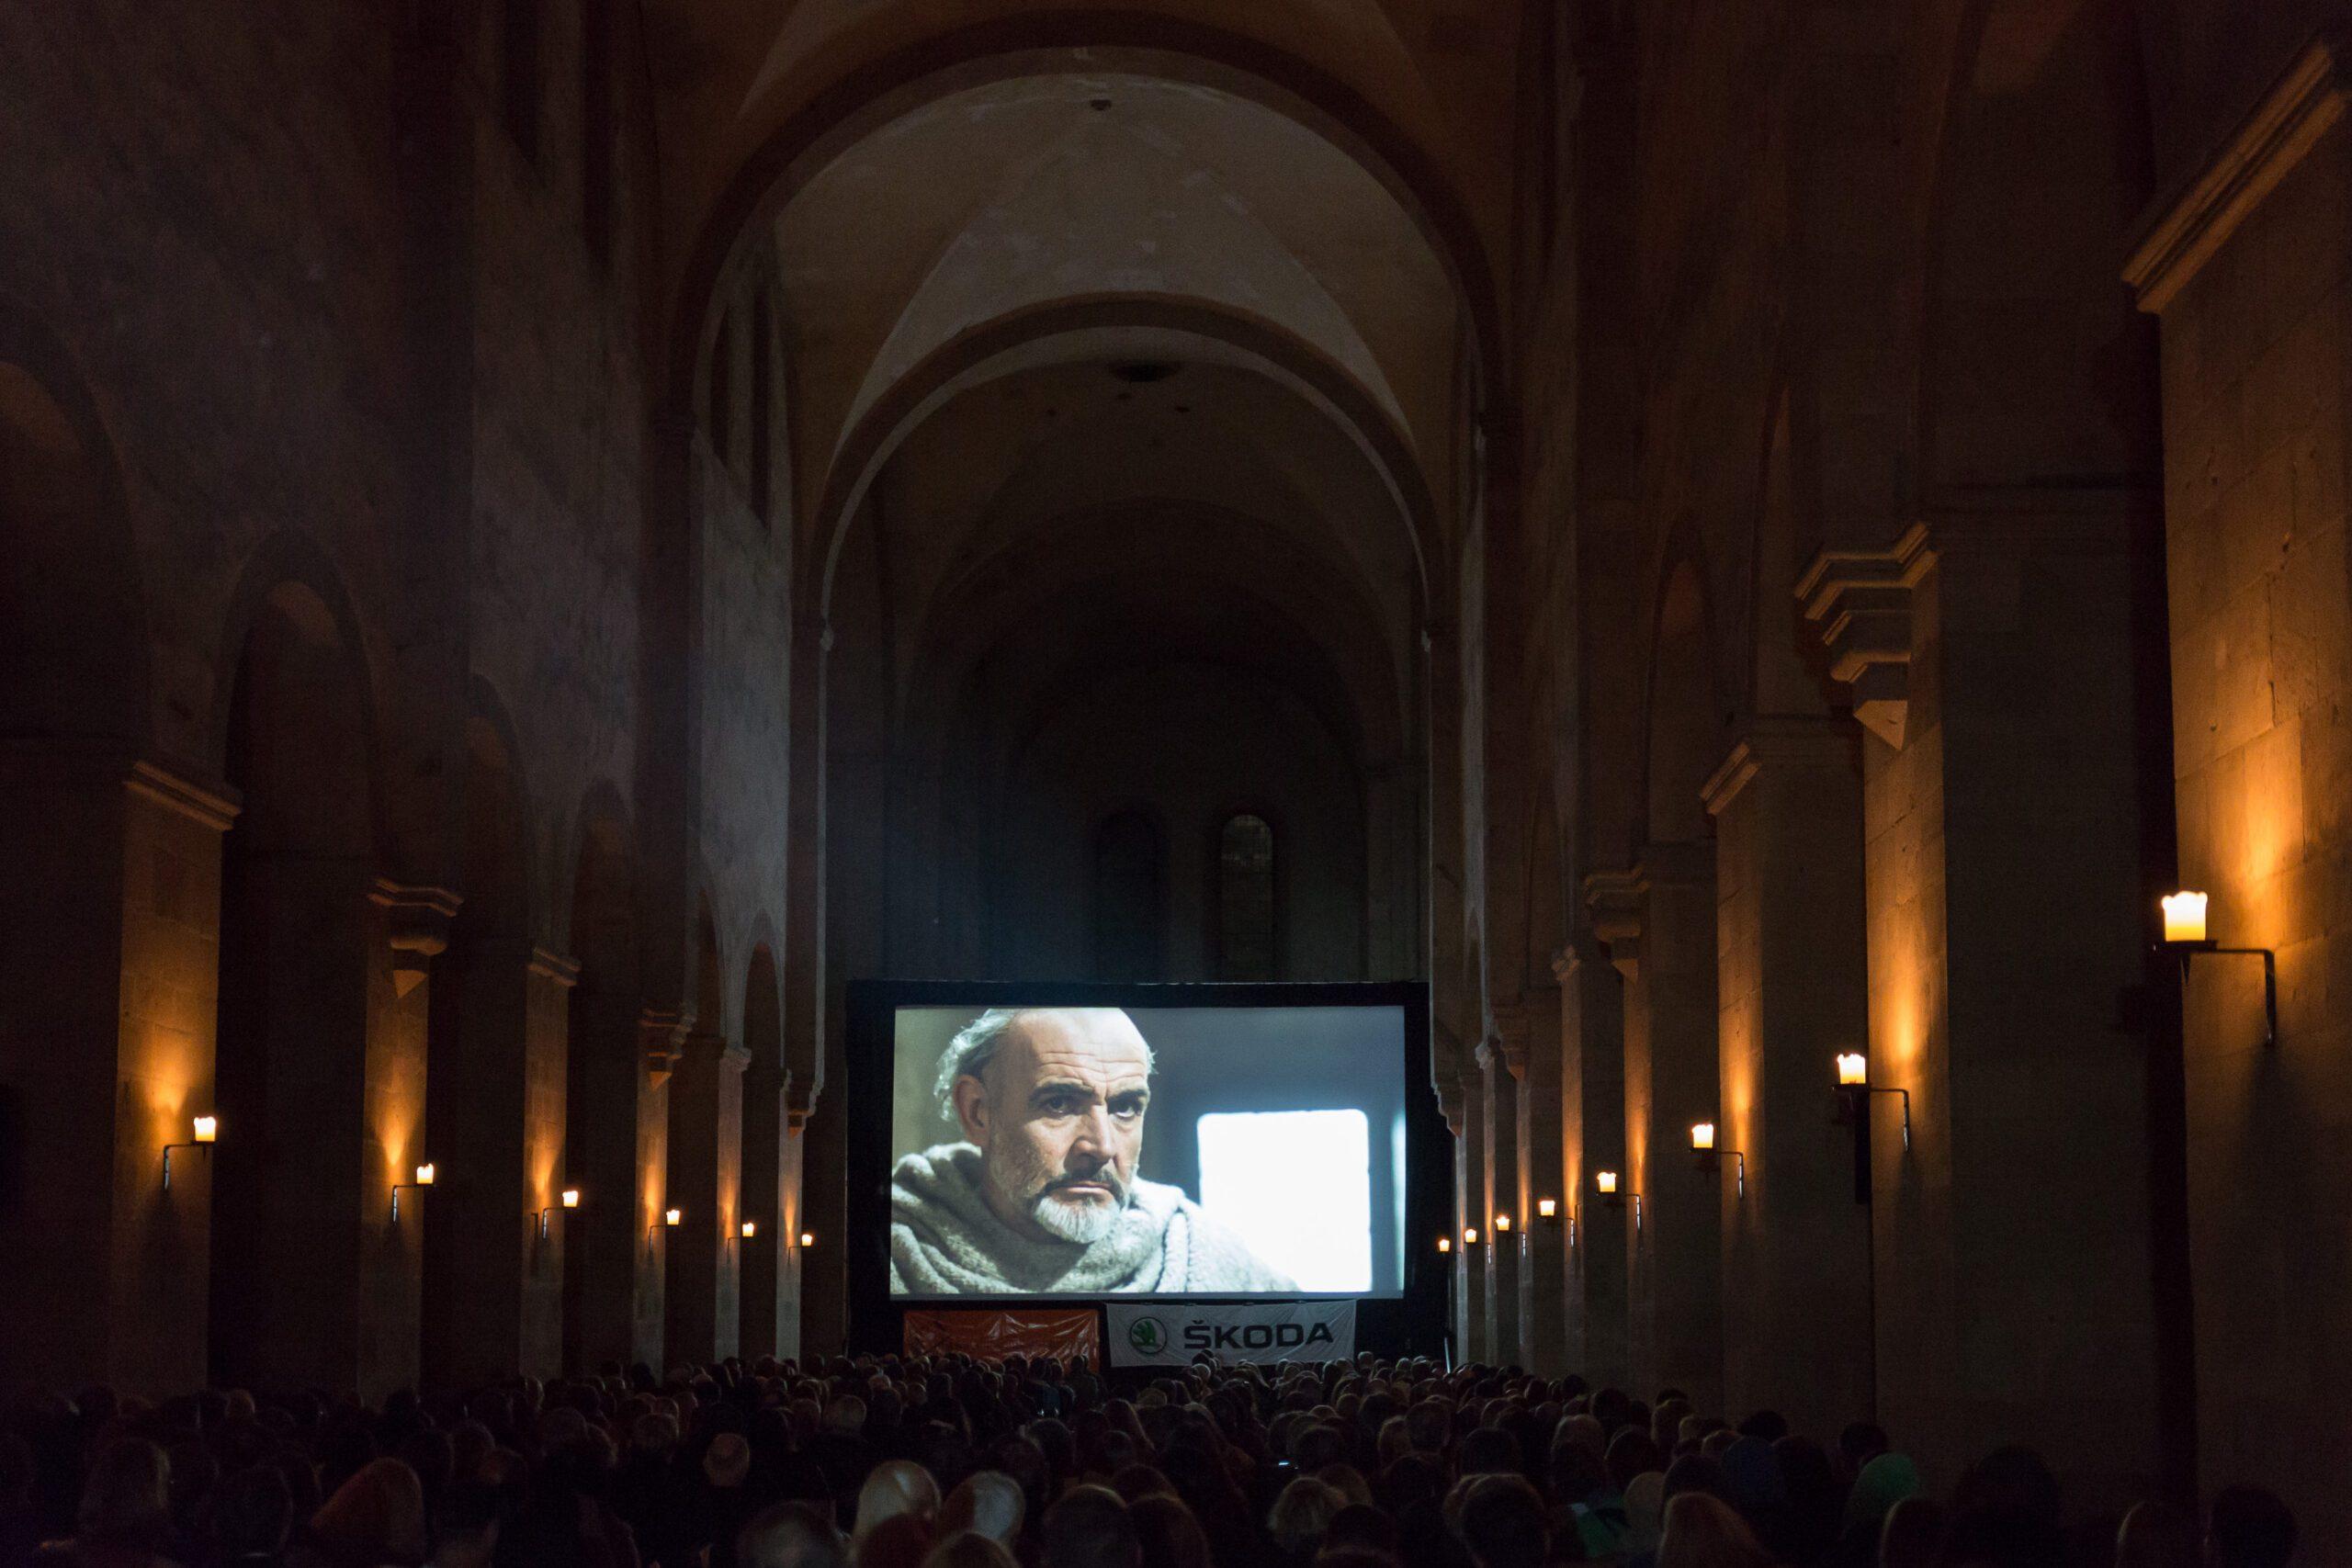 Jörg Schellschmidt - Eventfotografie - Kinosommer Kloster Eberbach 2013